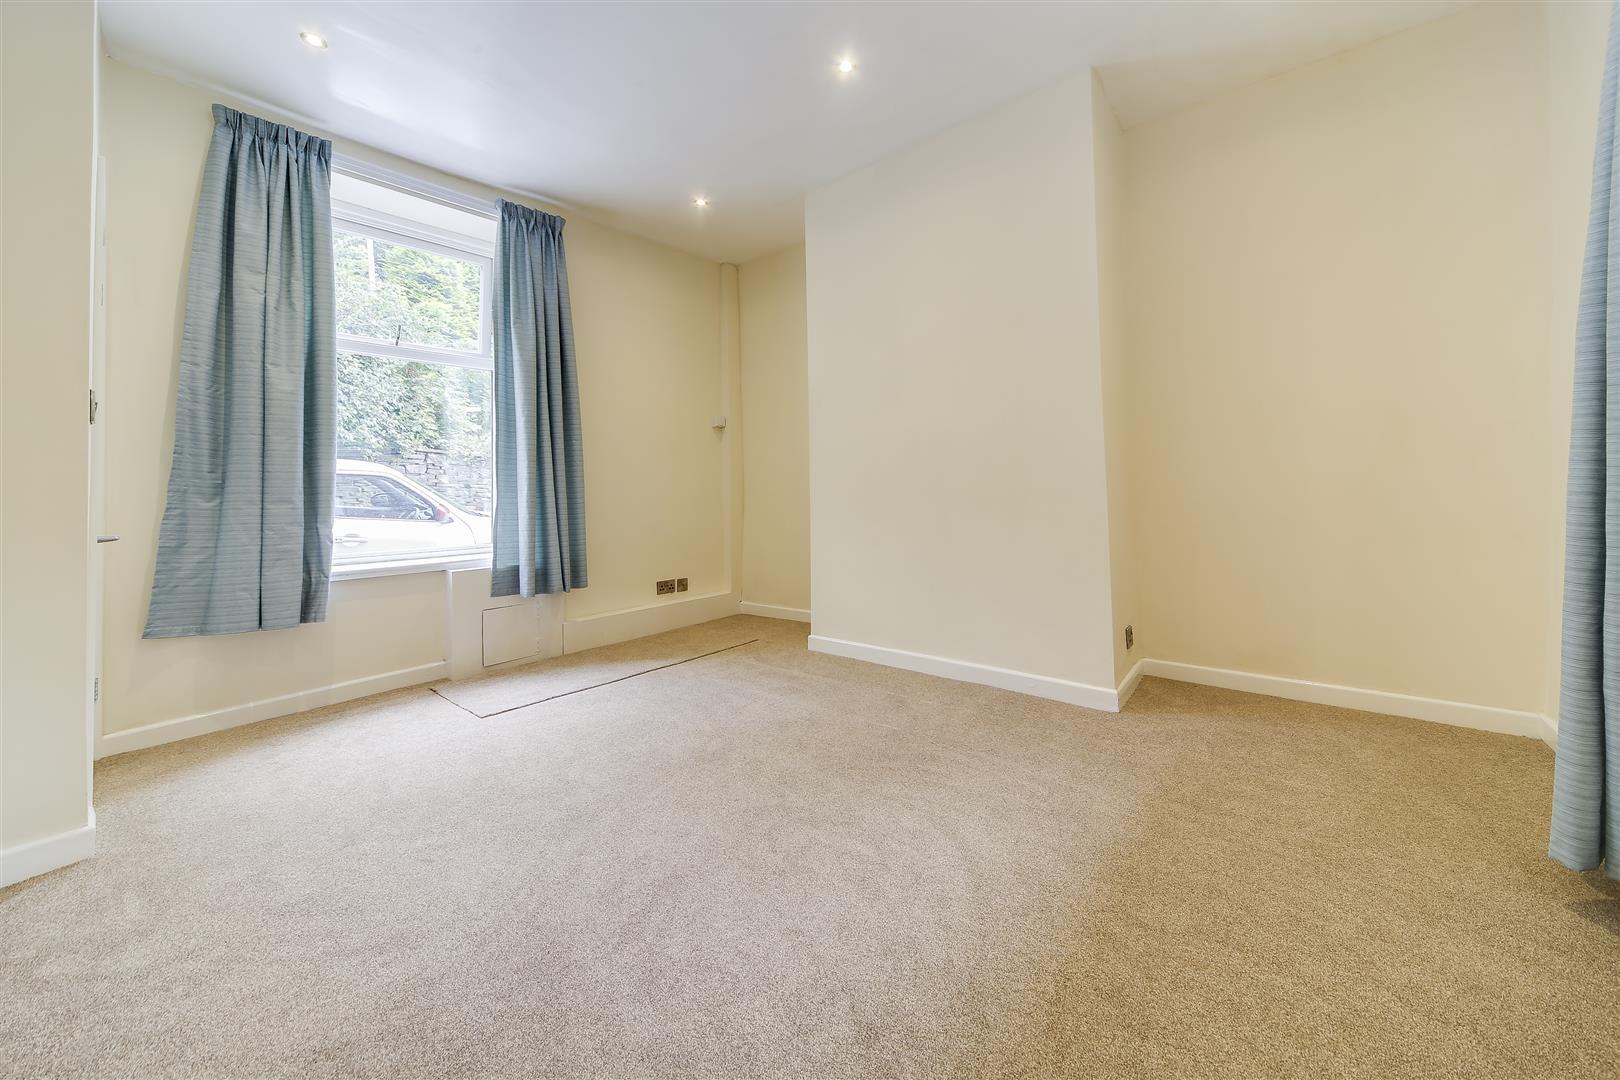 2 bedroom house for sale prospect hill rossendale lancashire bb4